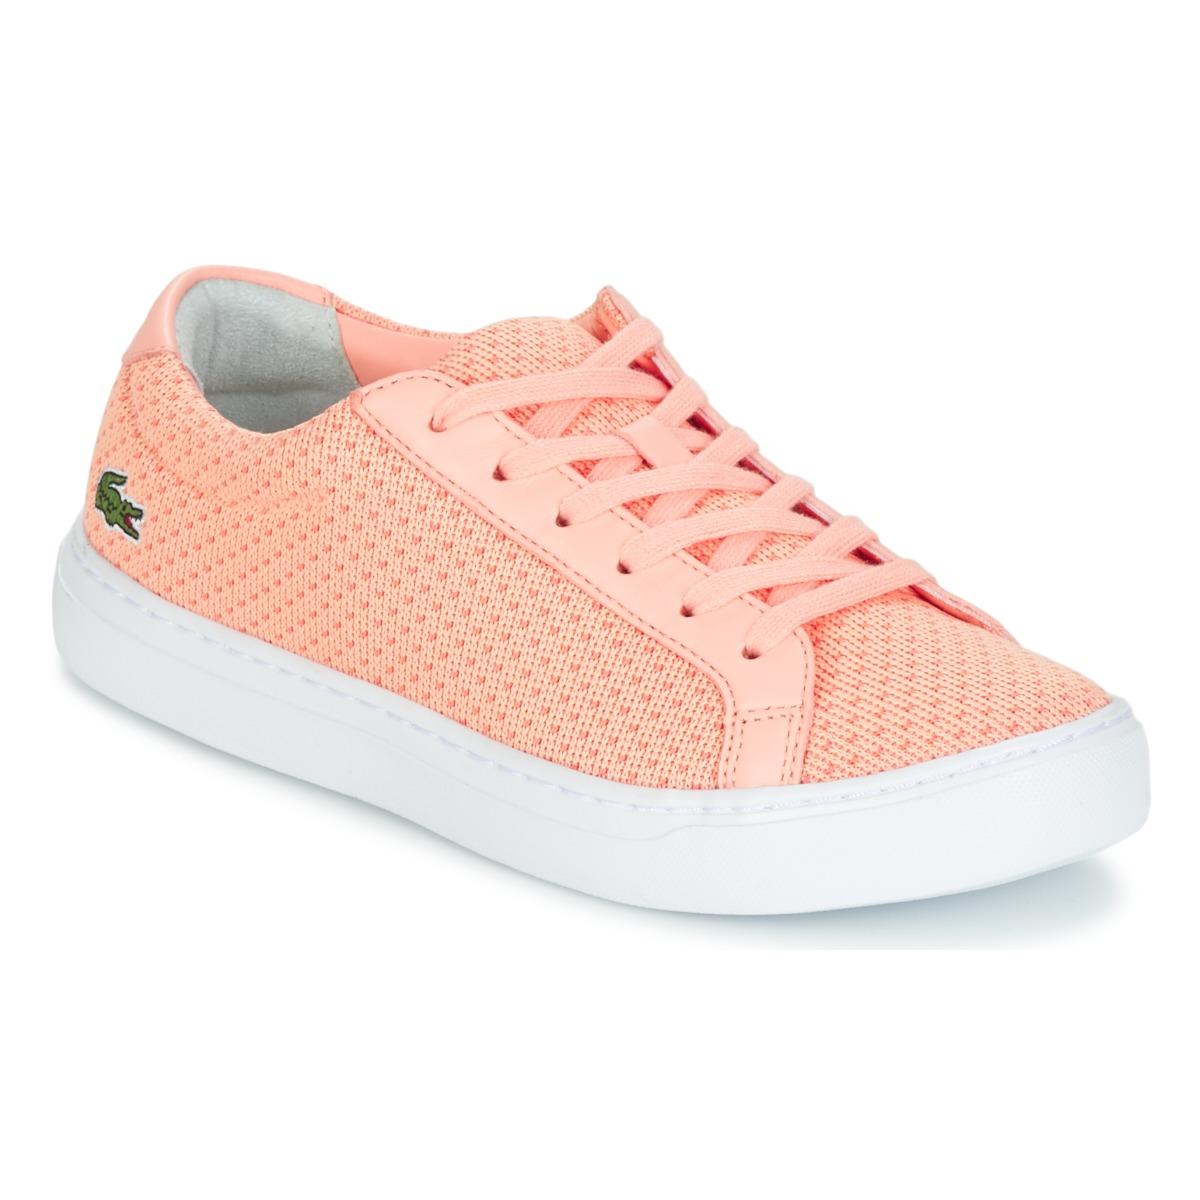 Lacoste L1212 LIGHTWEIGHT1181 Rose - Kostenloser Versand bei Spartoode ! - Schuhe Sneaker Low Damen 54,50 €